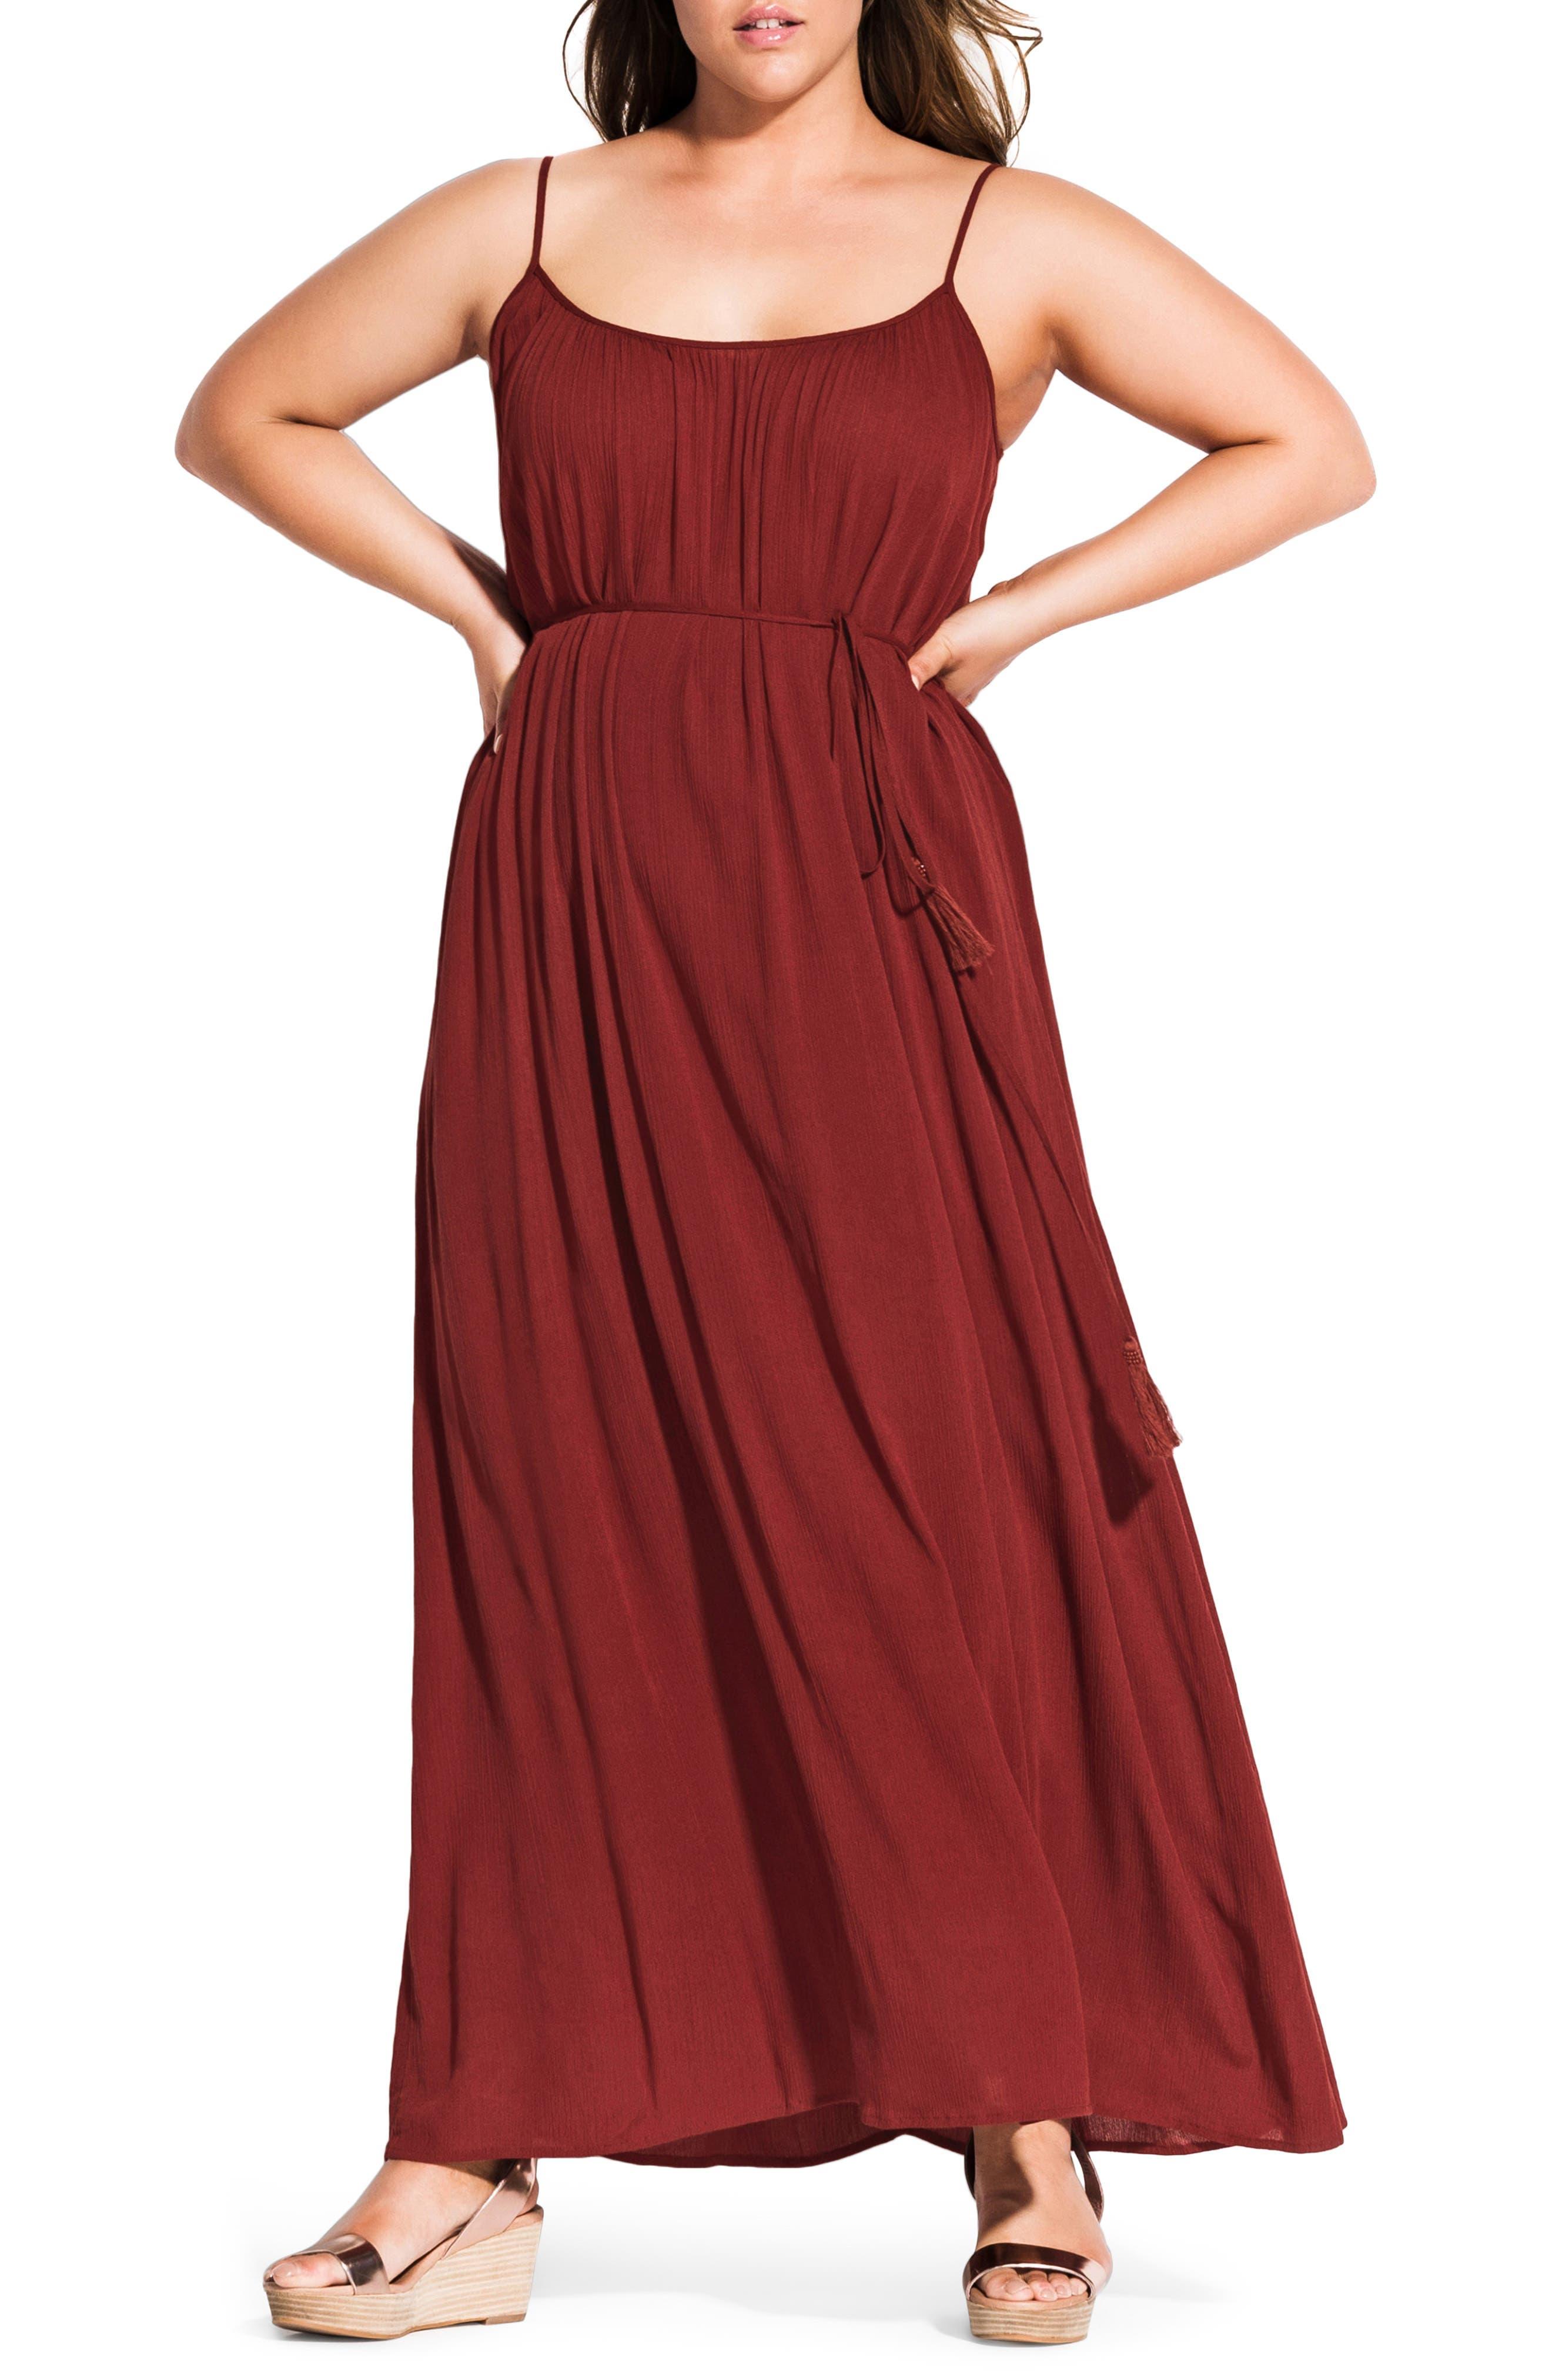 Plus Size Chic City Paradise Maxi Dress, Orange